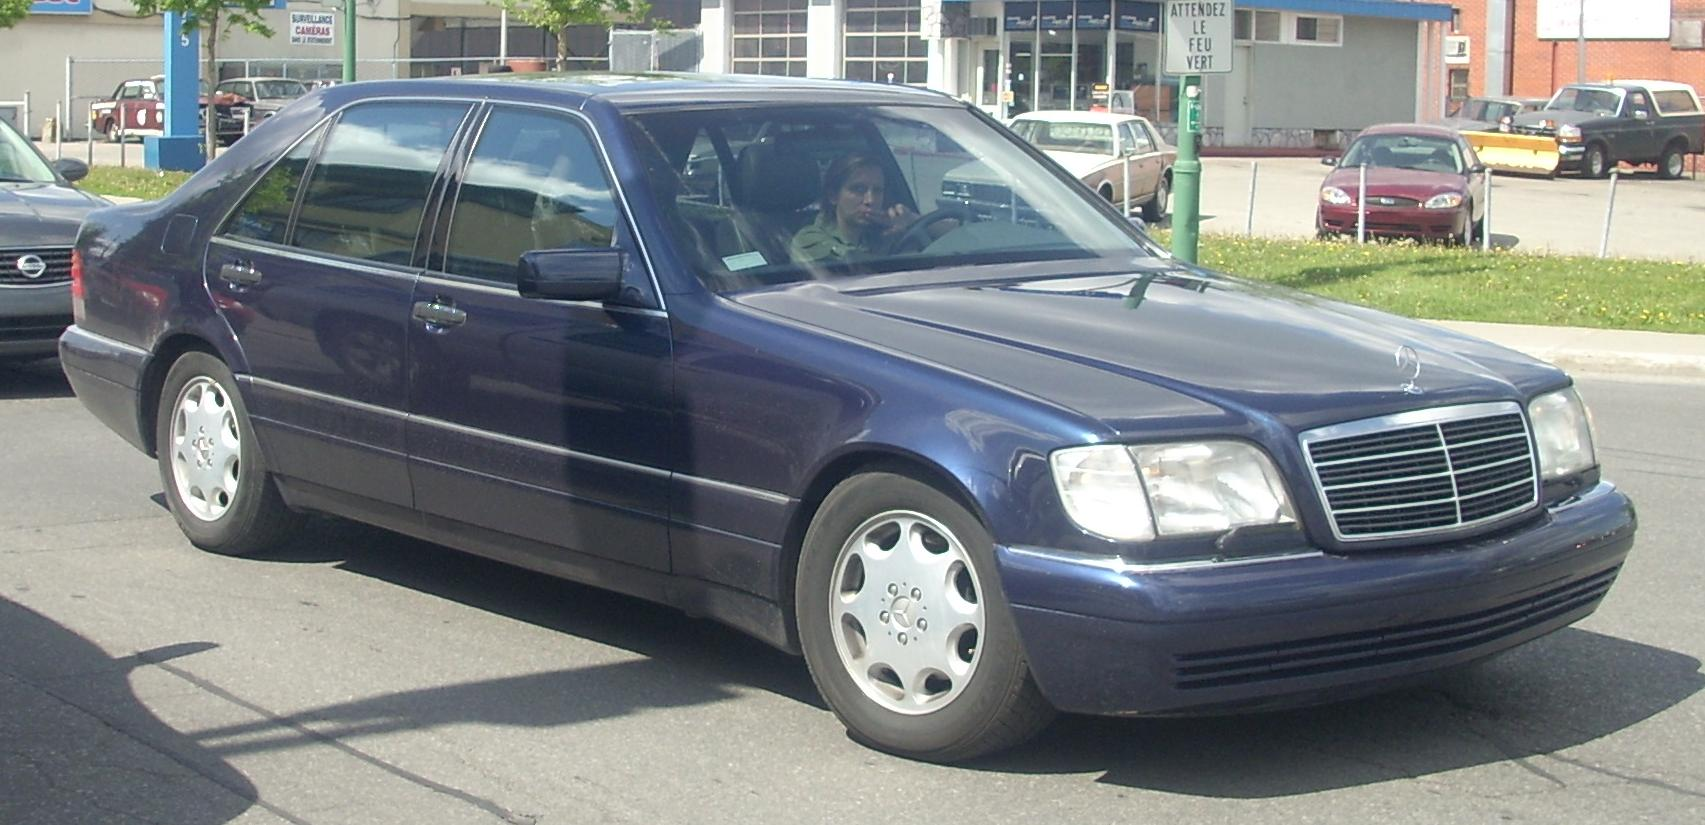 1992 mercedes benz 600 class information and photos for Mercedes benz 1992